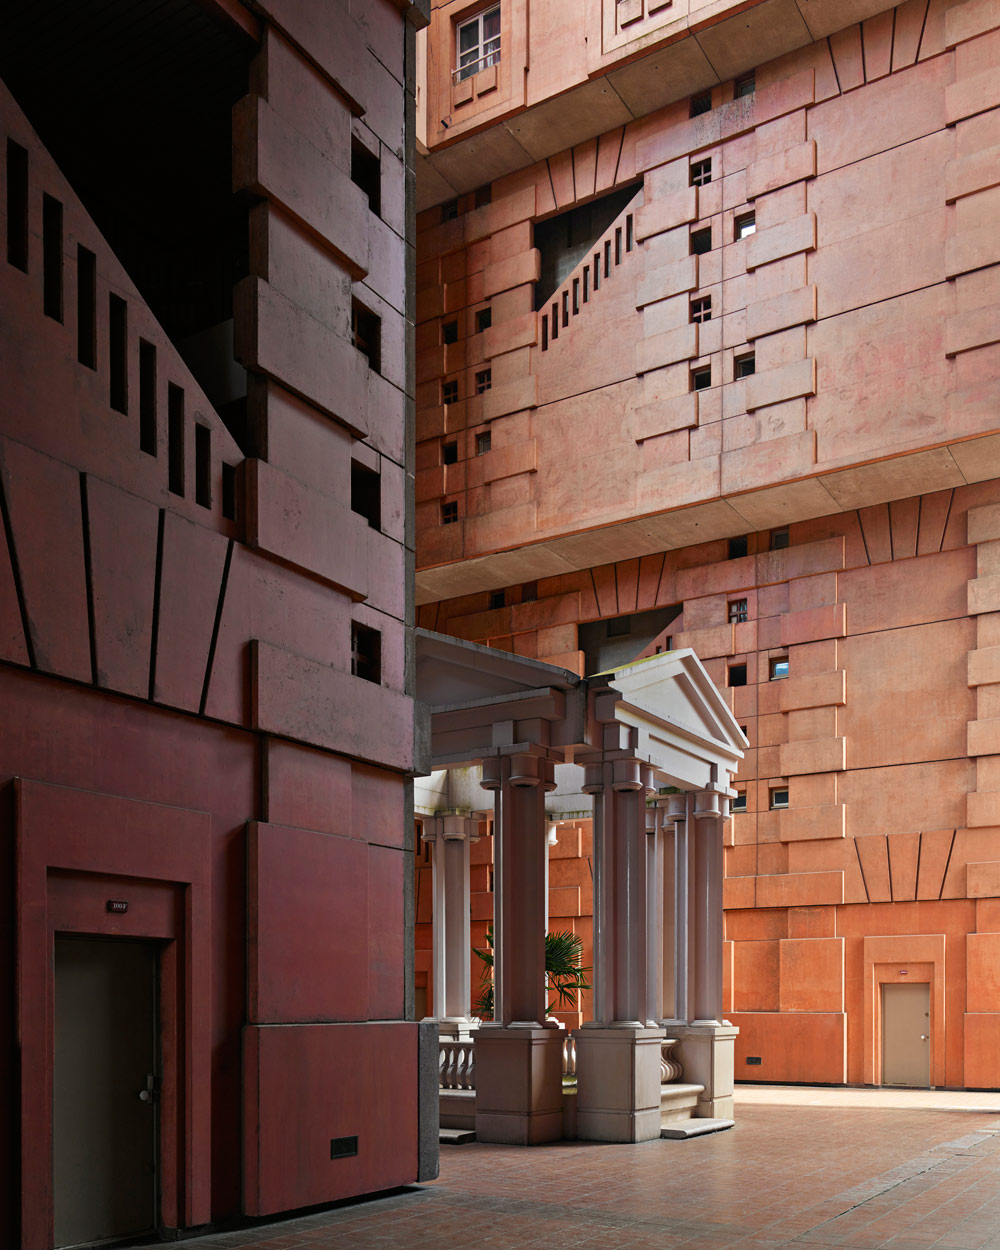 Les_Espaces_Abraxas_Marne_la_Valle_Paris_France_Ricardo_Bofill_Taller_Arquitectura_12